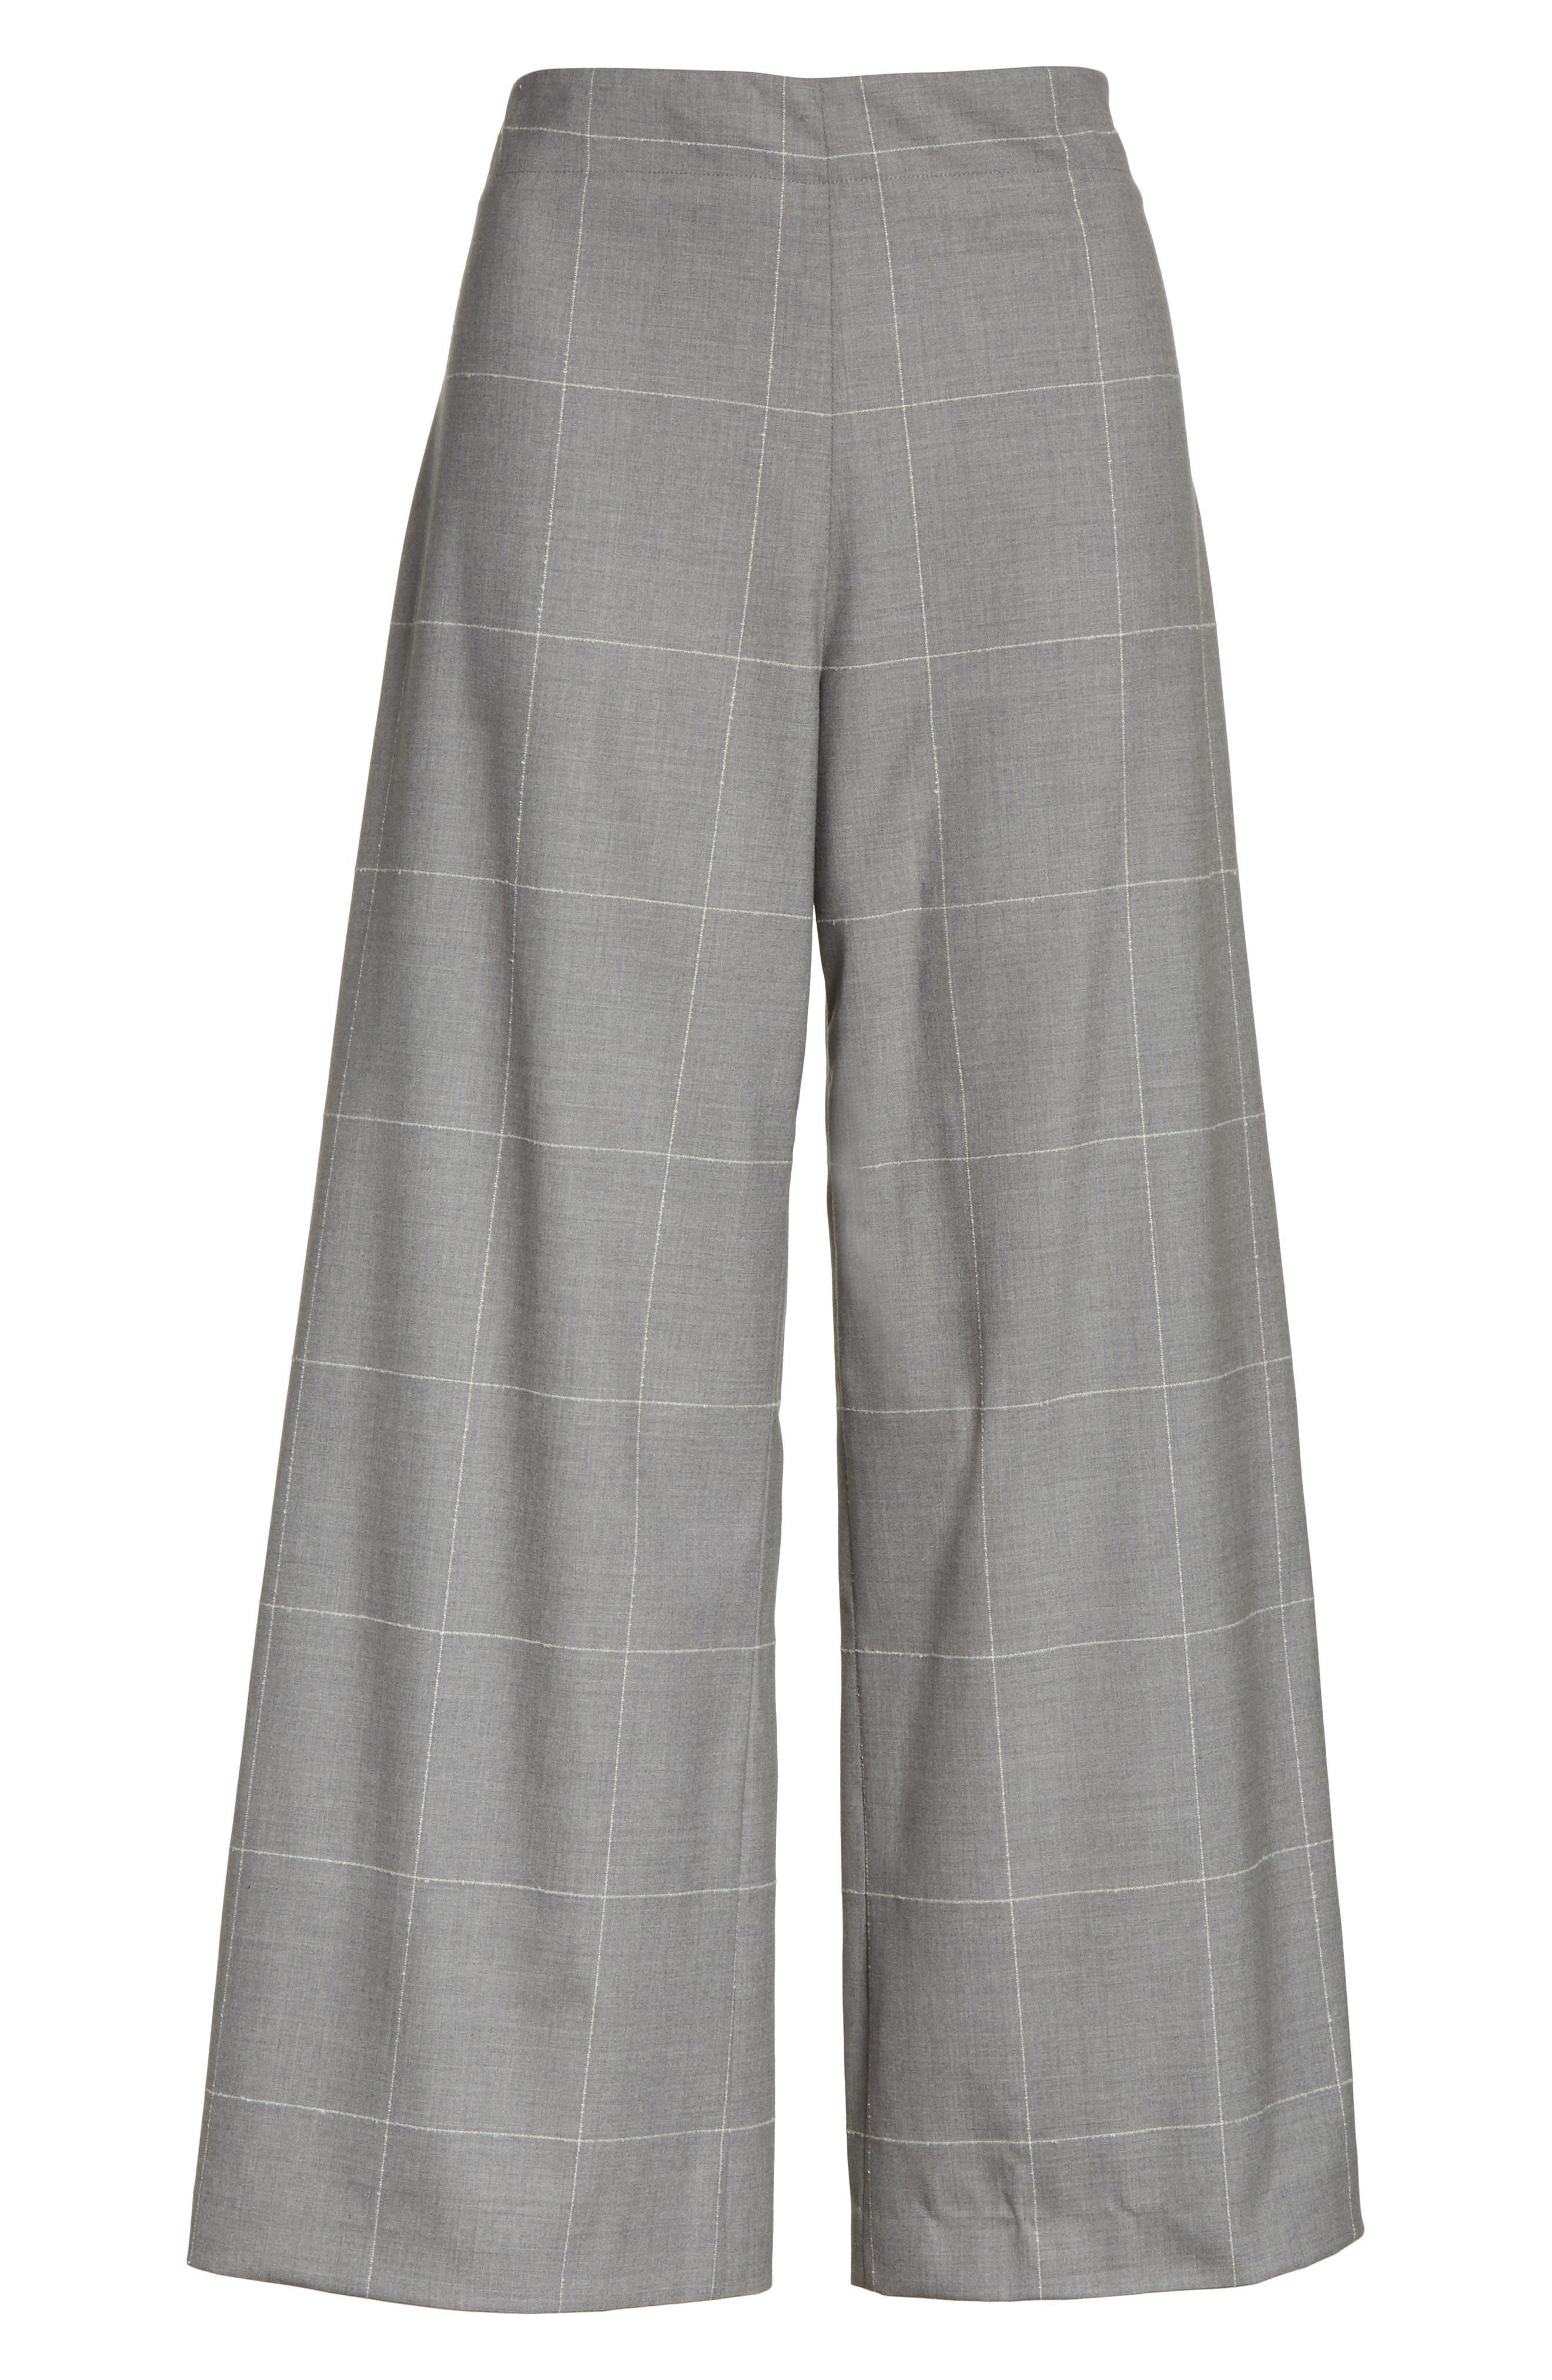 Windowpane Check Wool Wide Leg Crop Pants,                             Alternate thumbnail 6, color,                             062